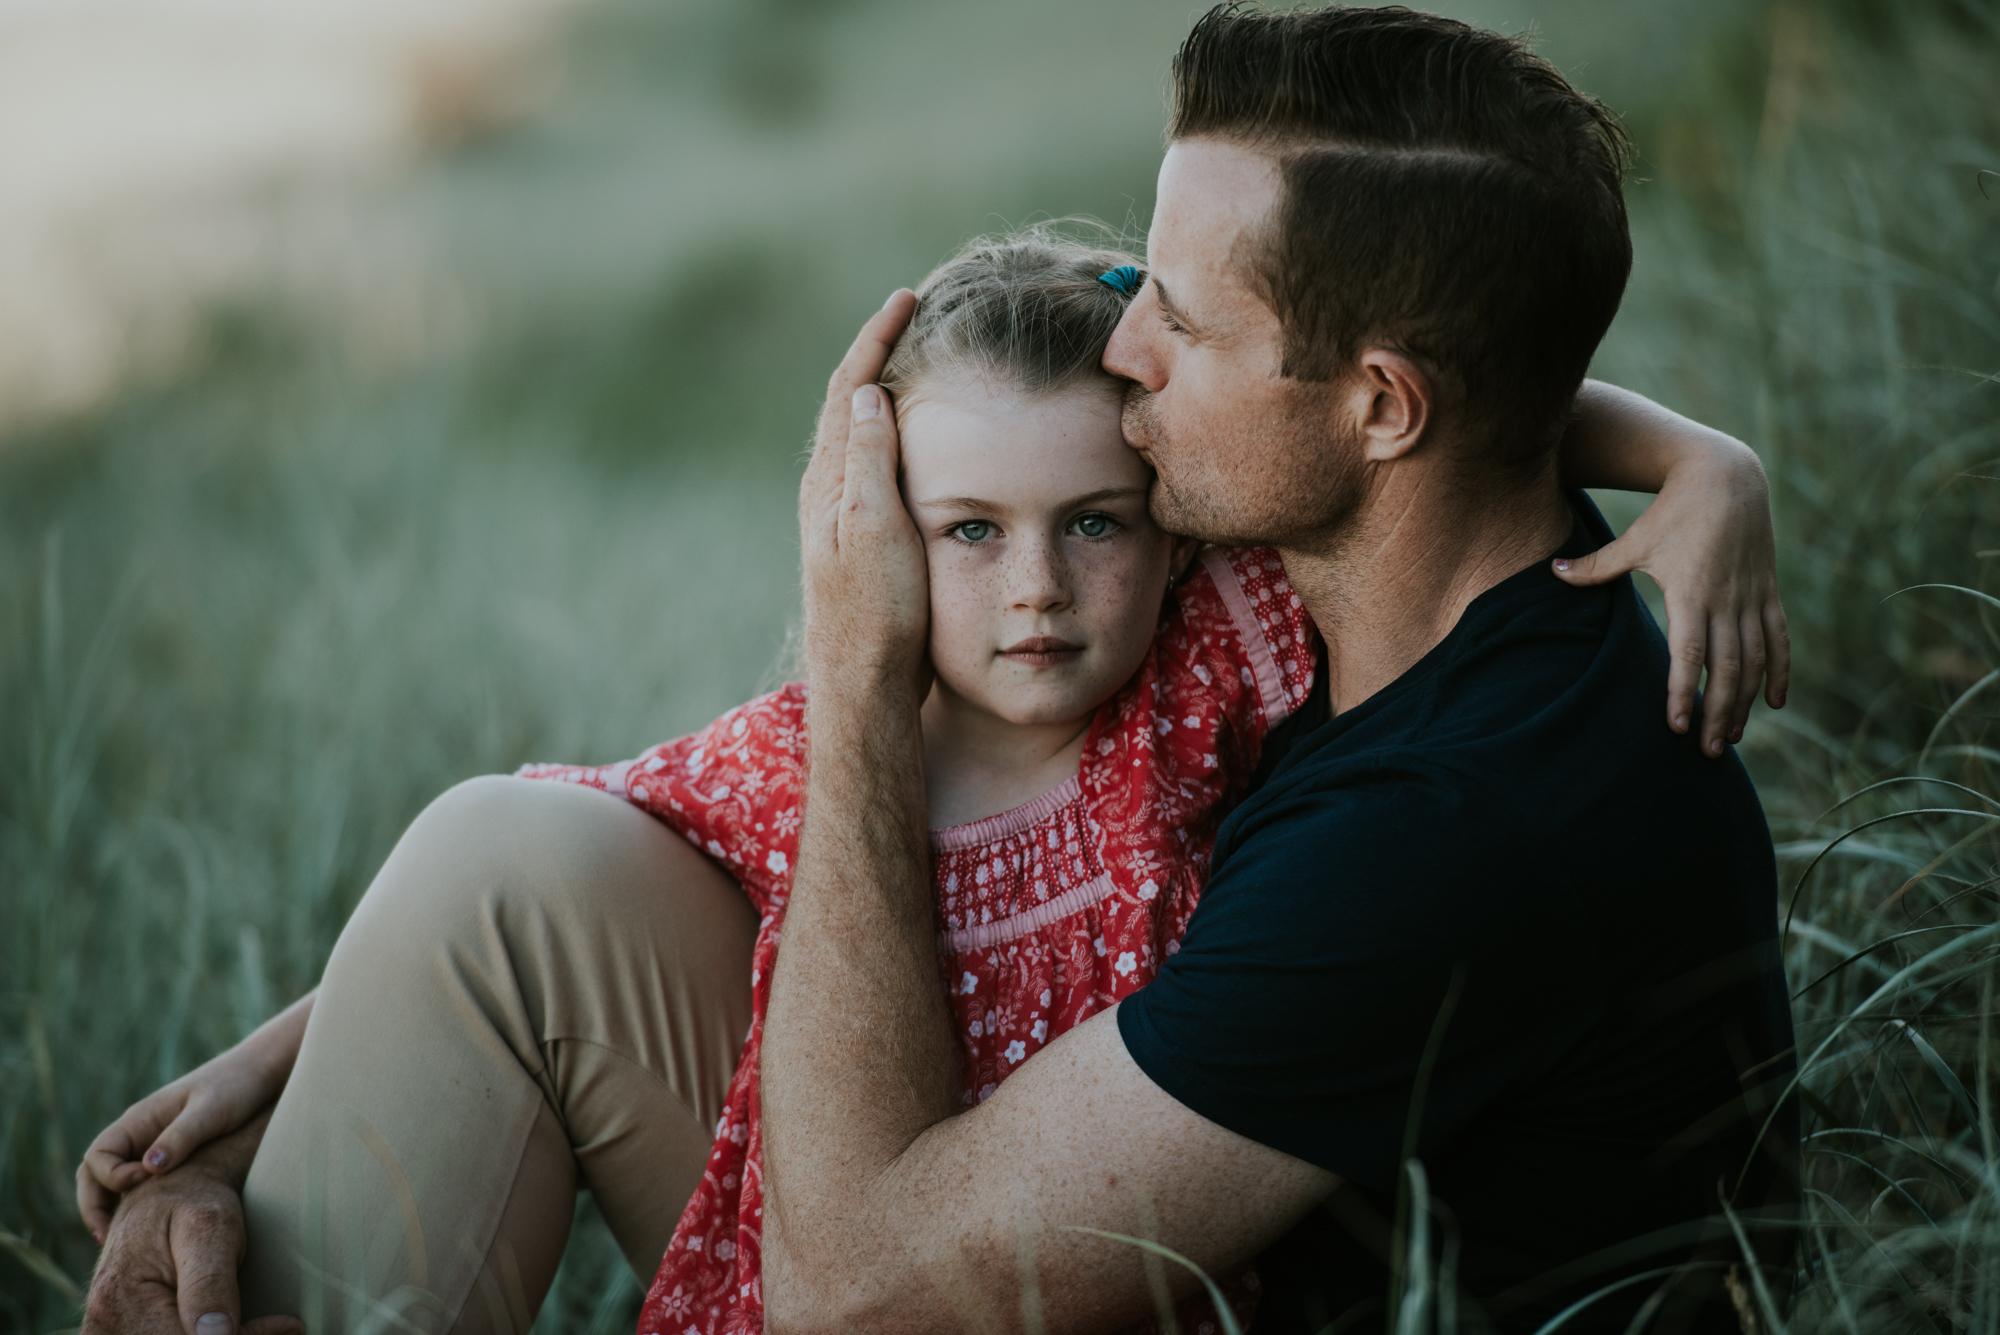 Brisbane Family Photographer | Newborn Photography-4.jpg